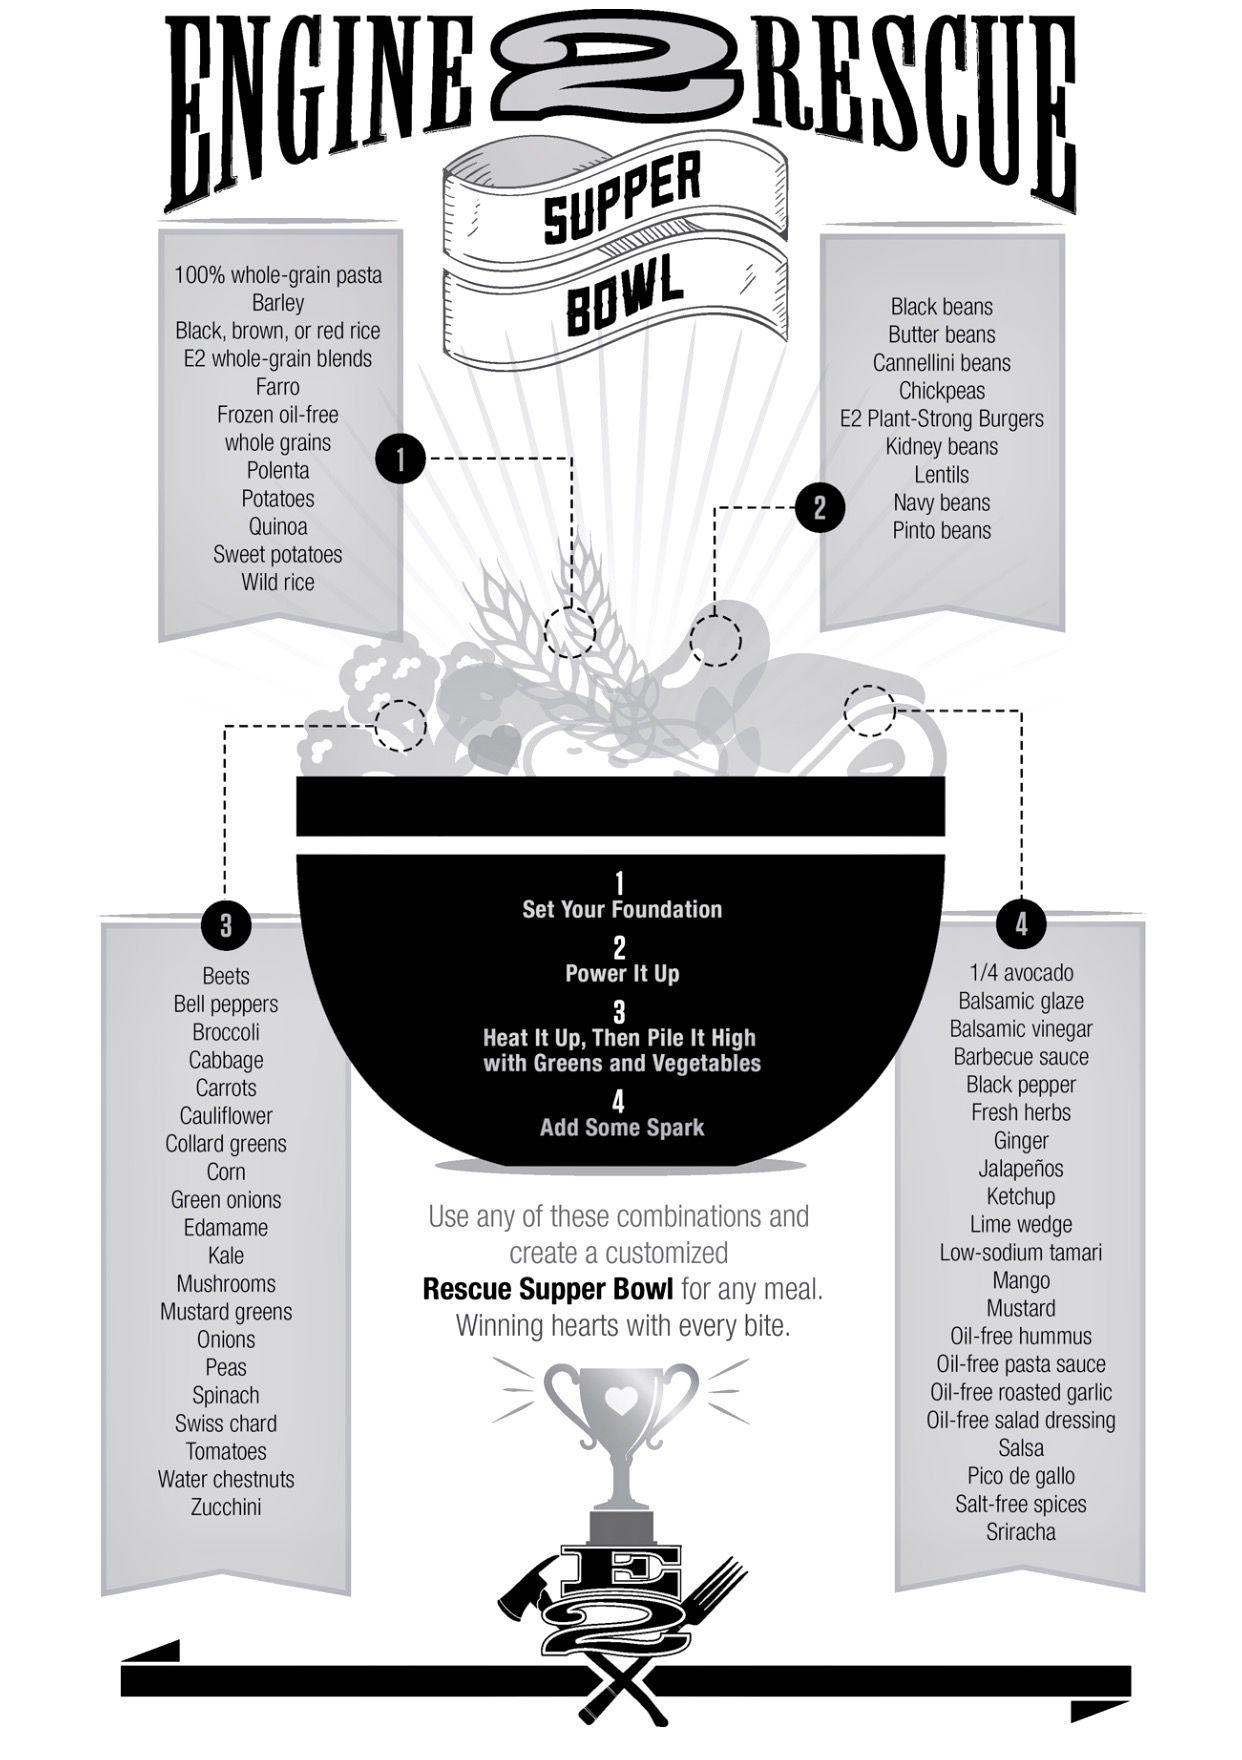 Engine 2 Rescue Super Bowl Plant Based Whole Foods, Plant Based Eating,  Plant Based